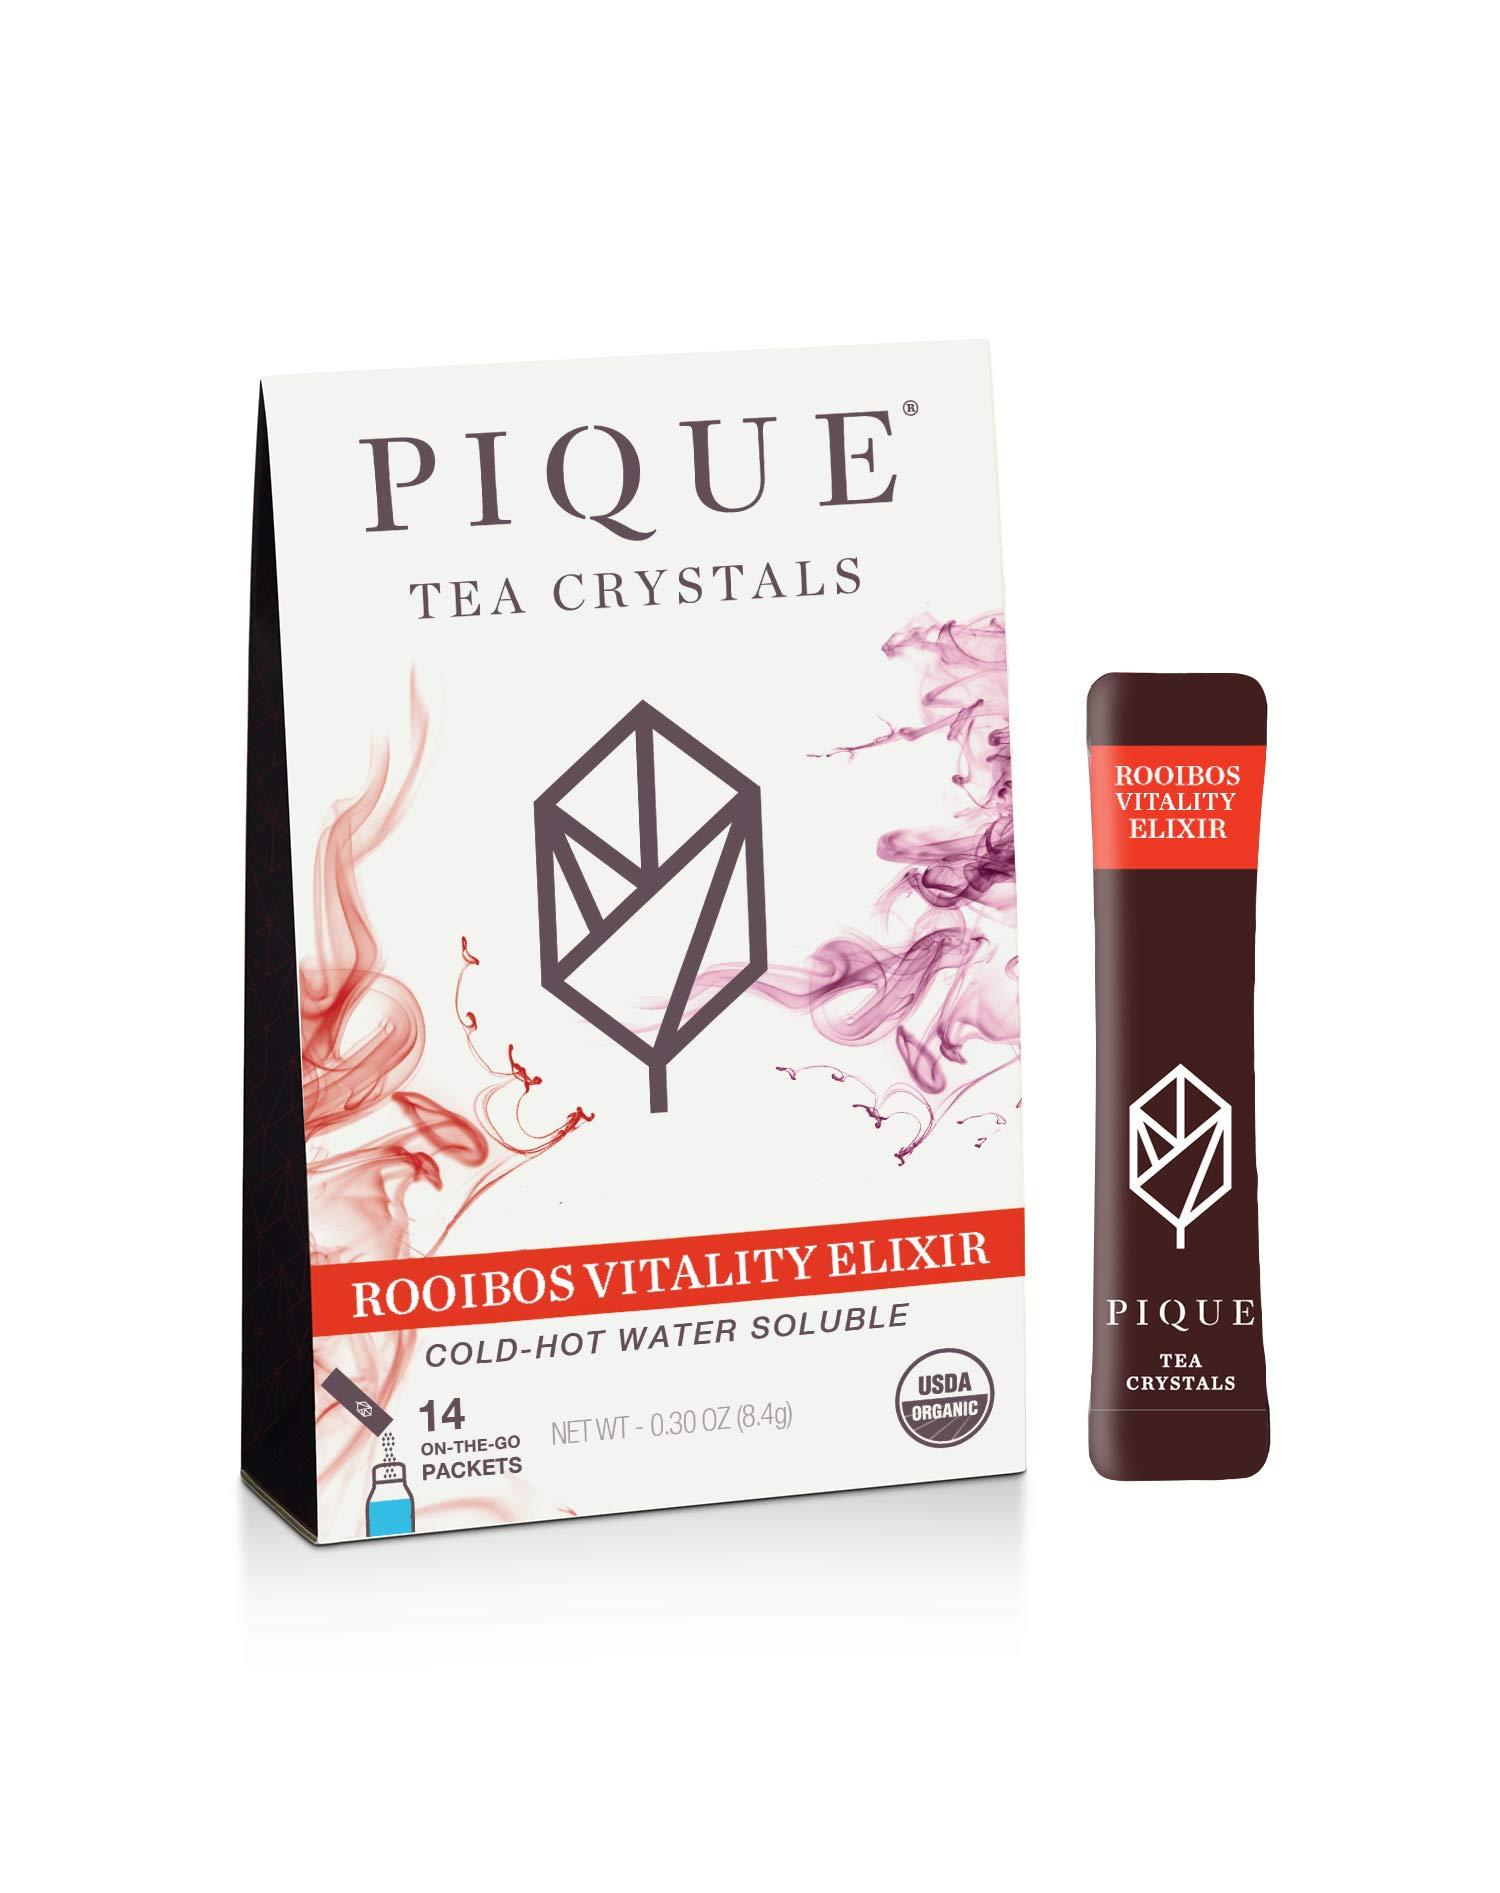 Pique Tea Organic Rooibos Vitality Elixir - Gut Health, Fasting, Calm - 1 Pack (14 Sticks) by PIQUE